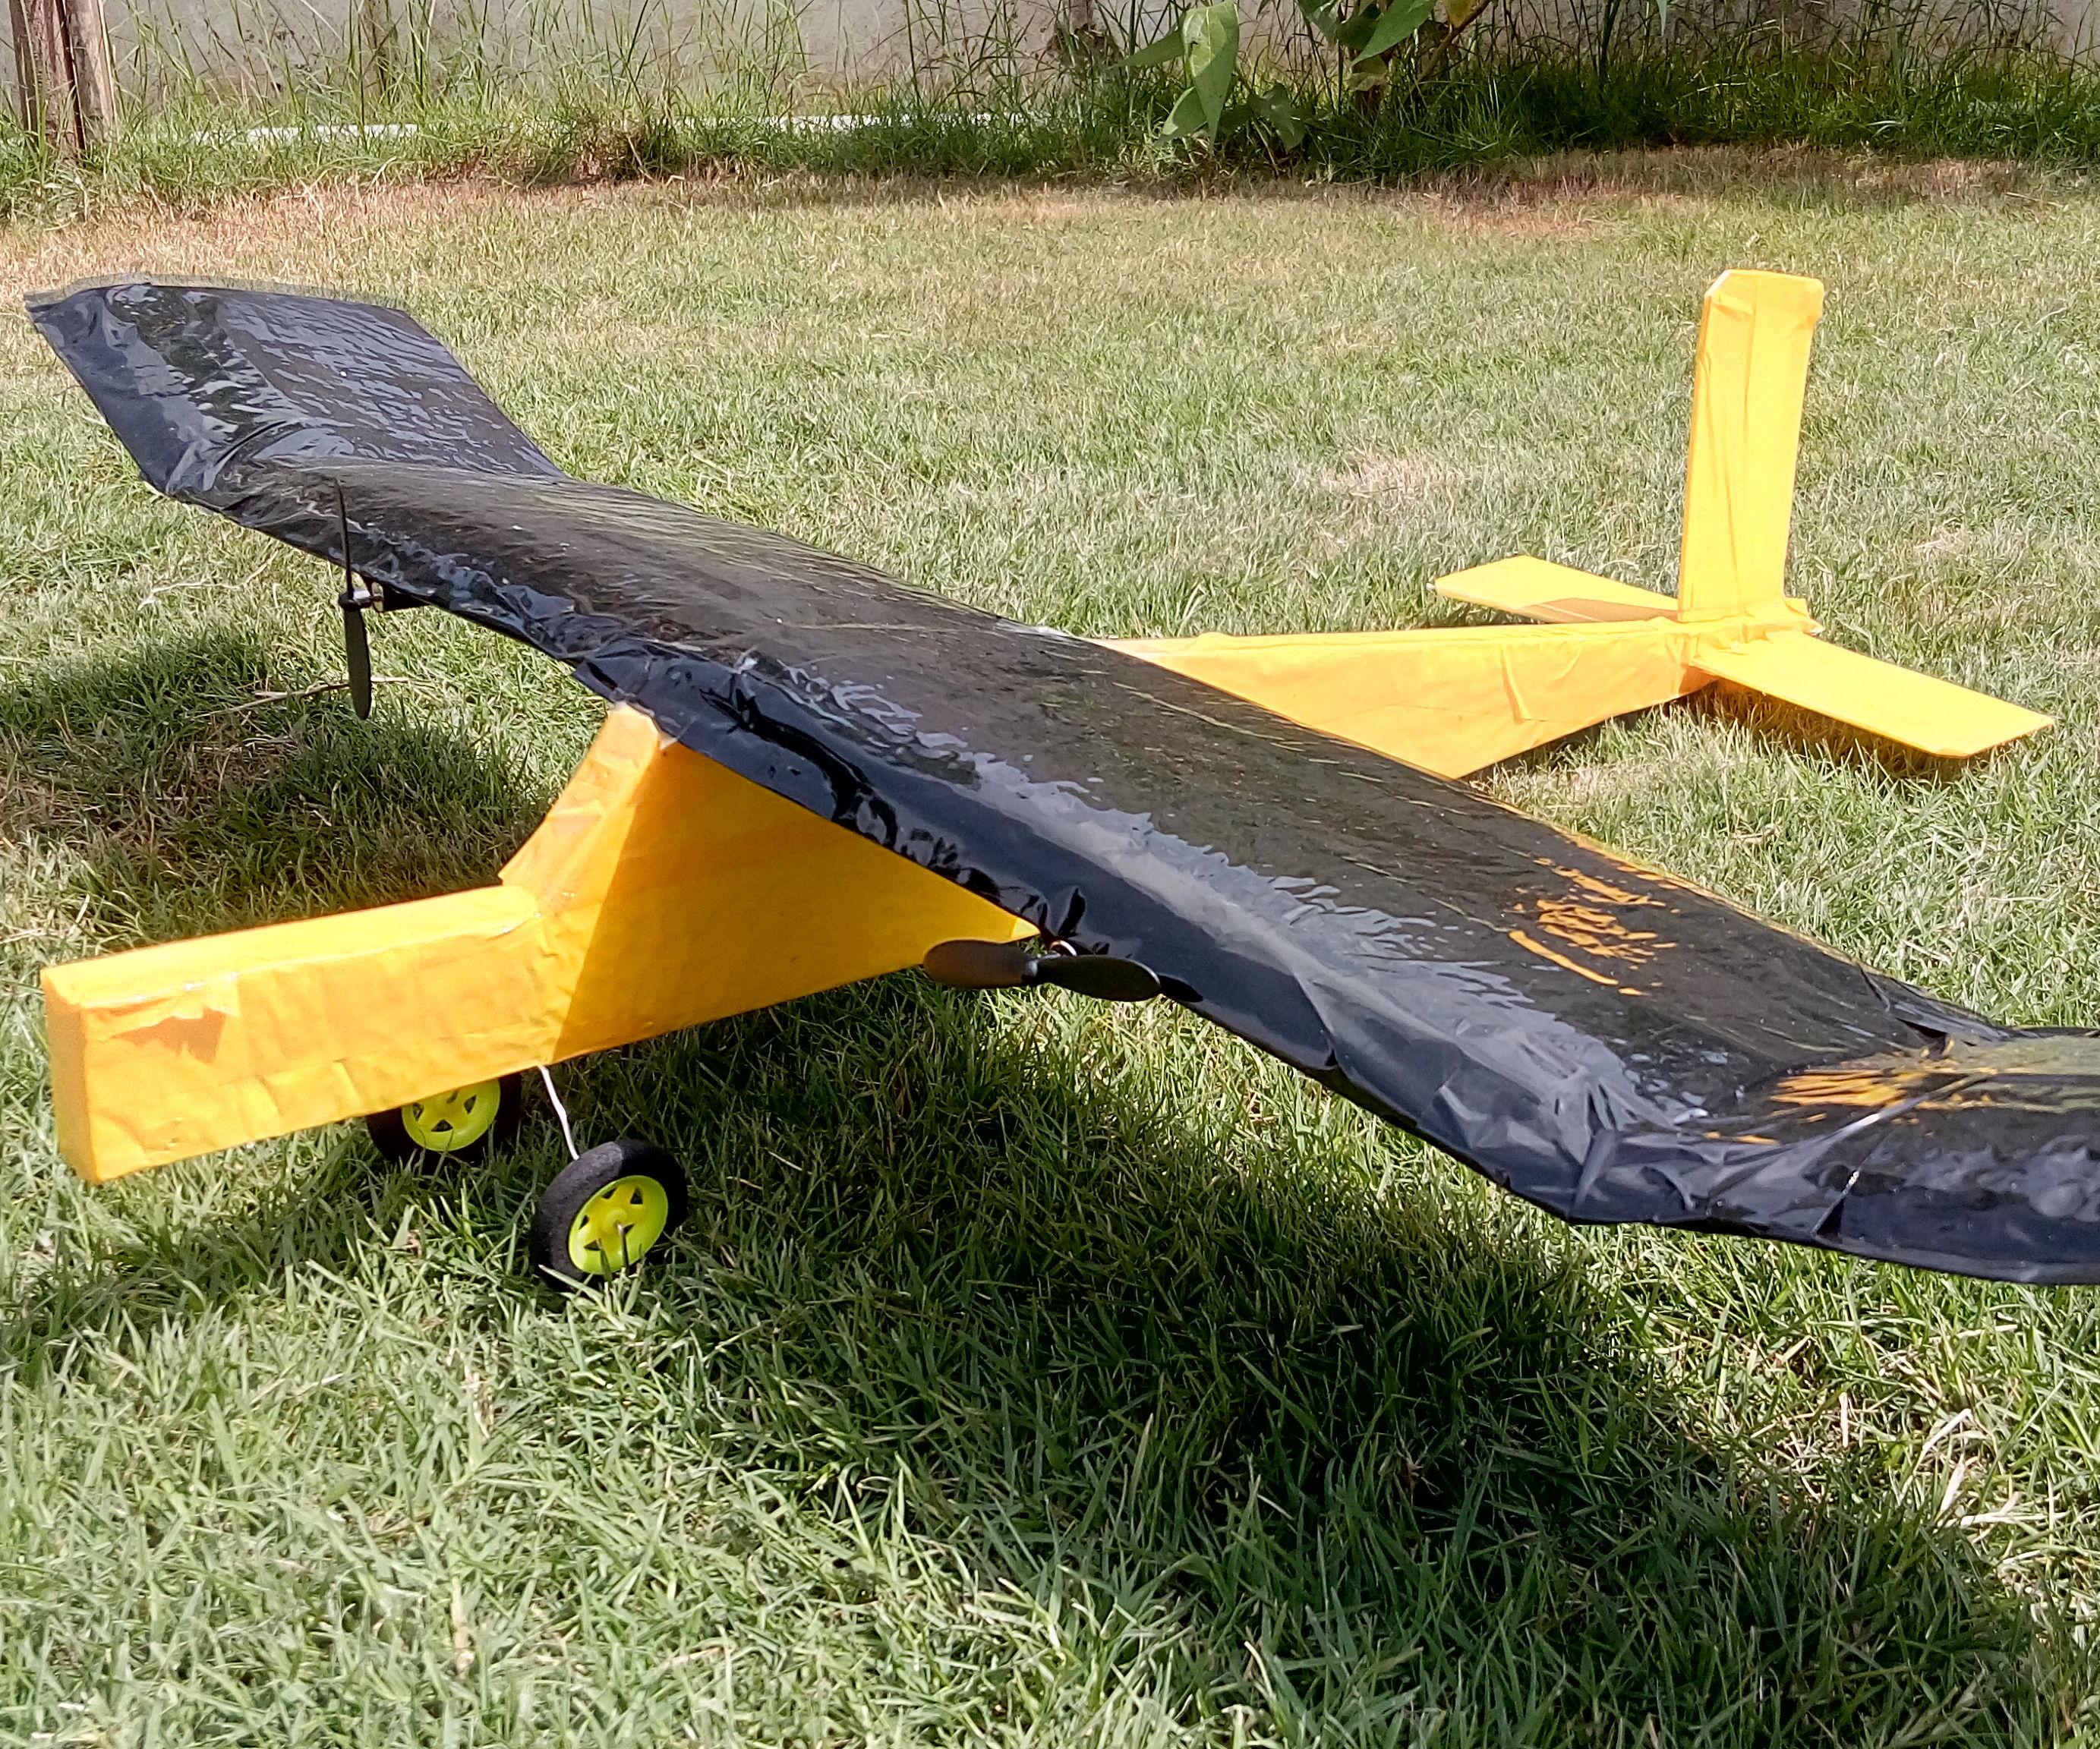 Bluetooth Controlled Rc Plane(Crashproof)